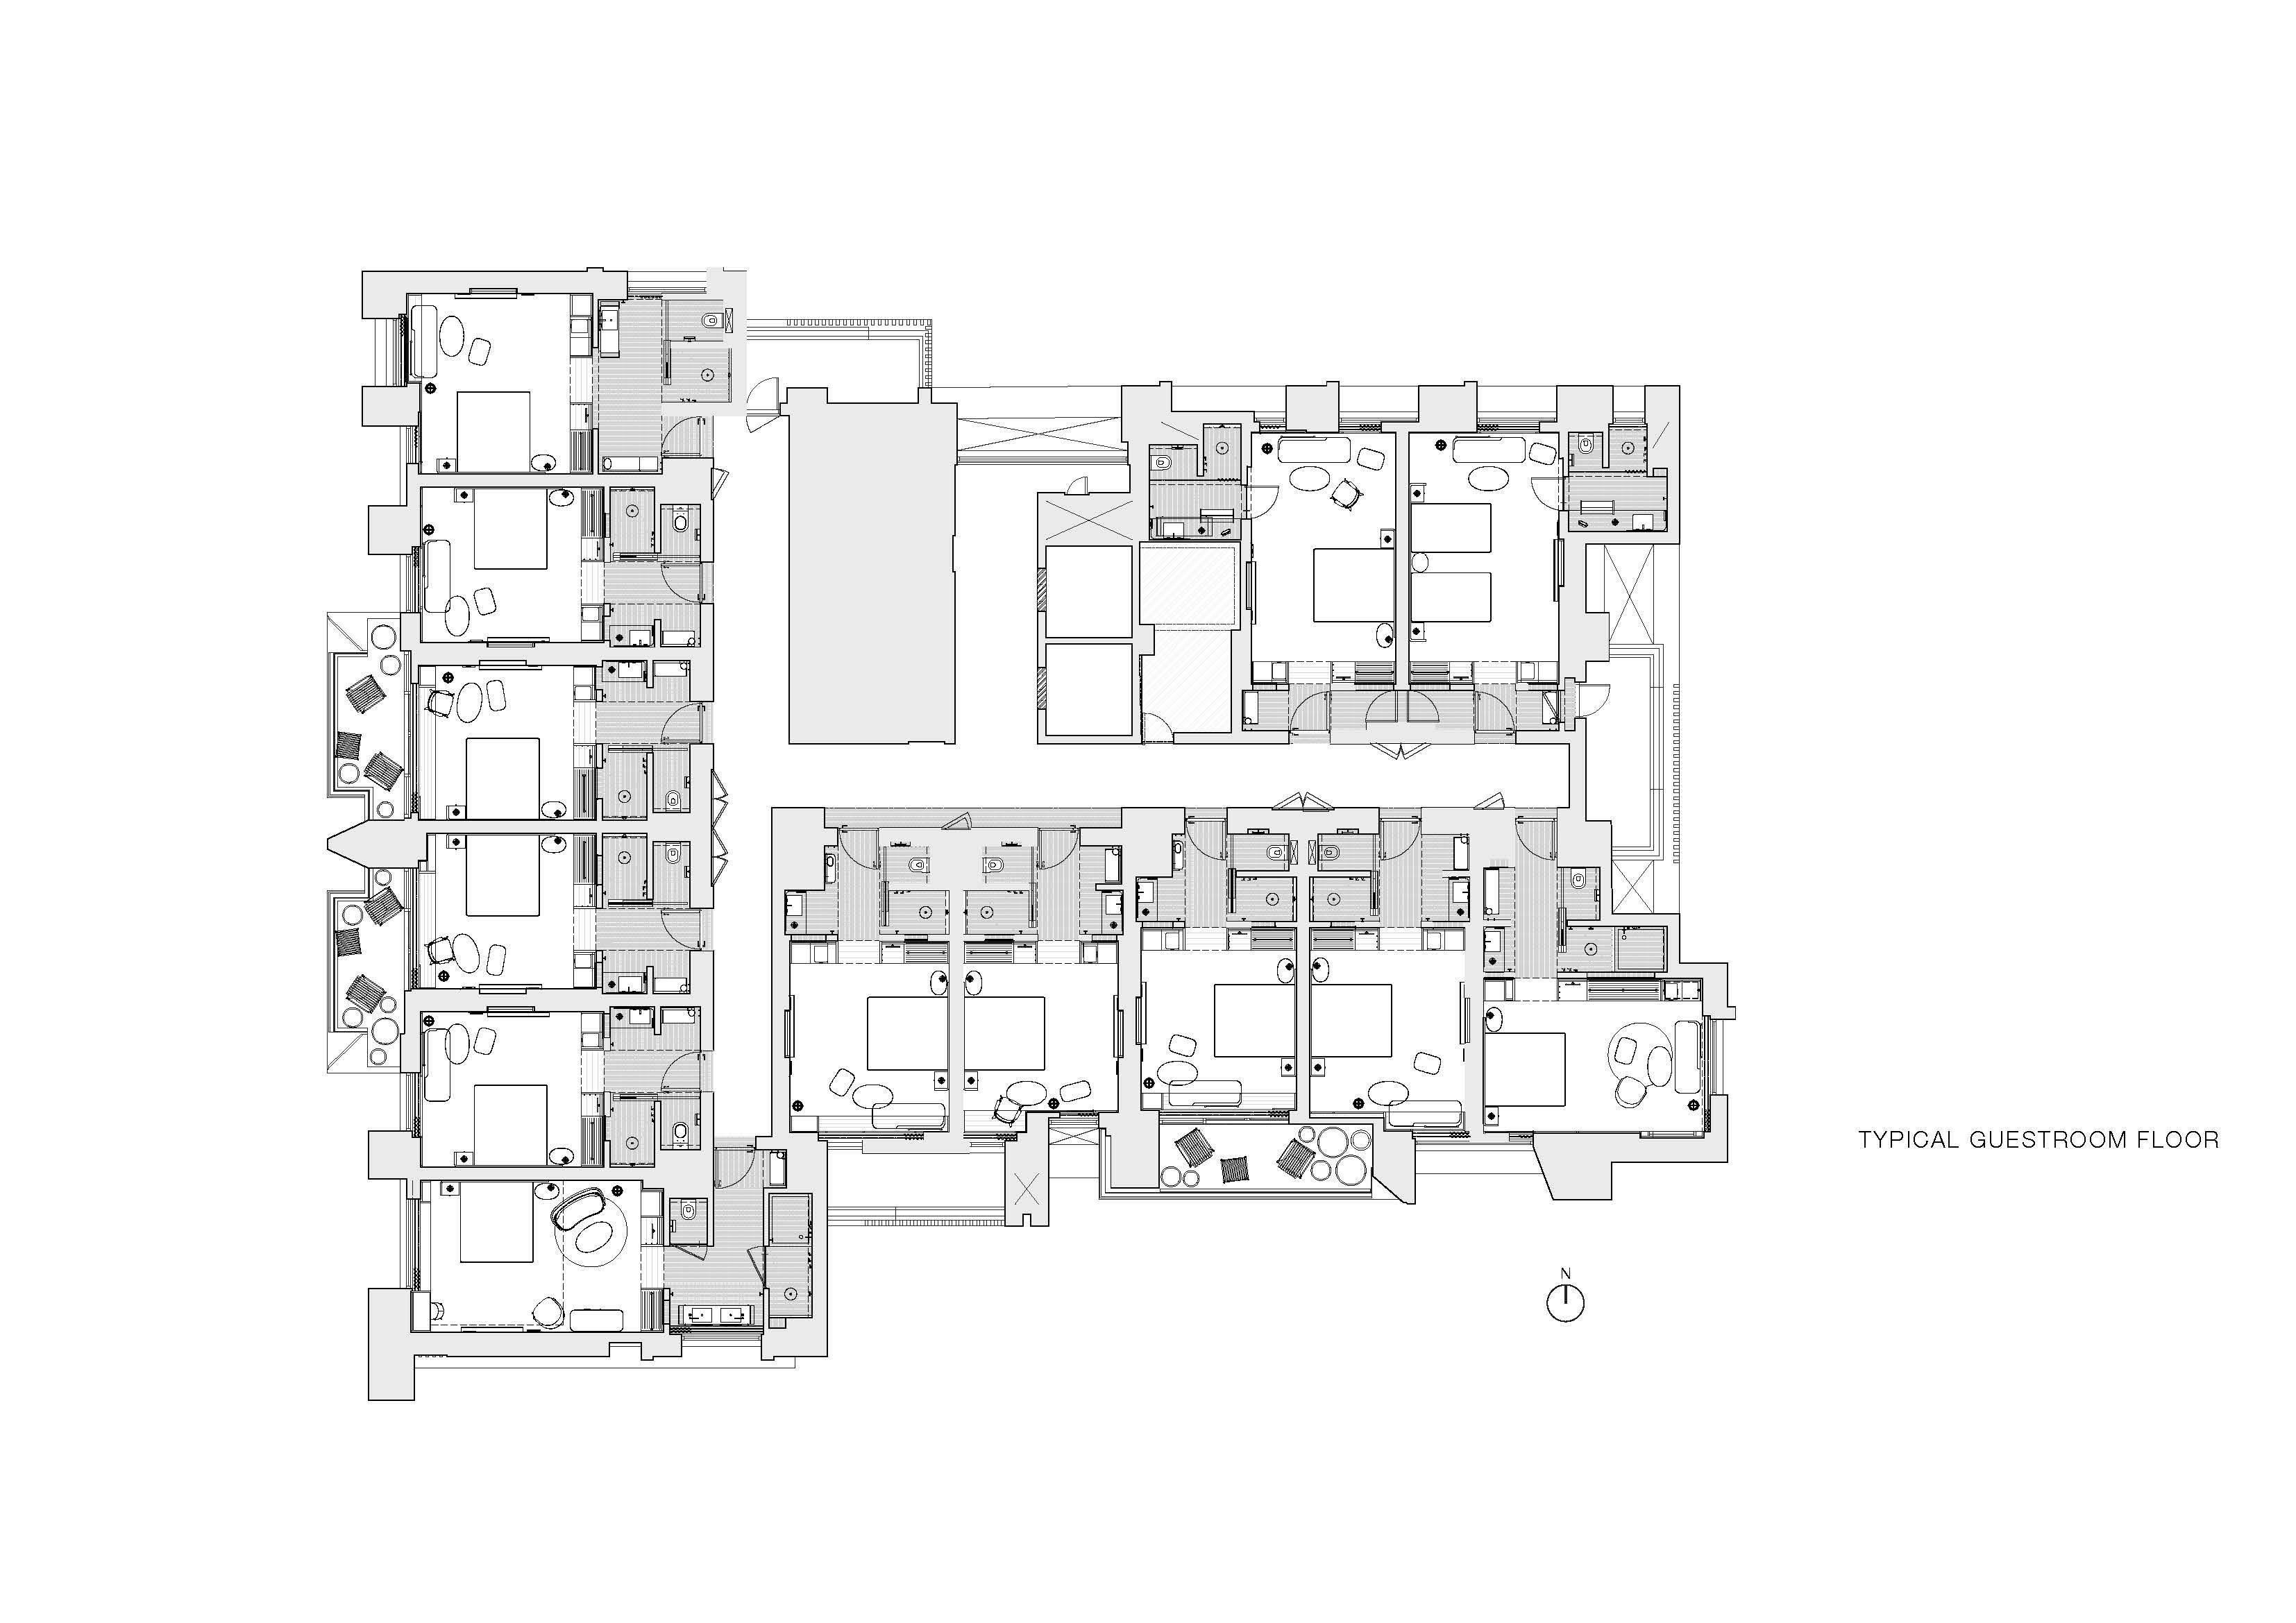 Kimpton Da An Hotel  Drawings Neri&Hu Design and Research Office}